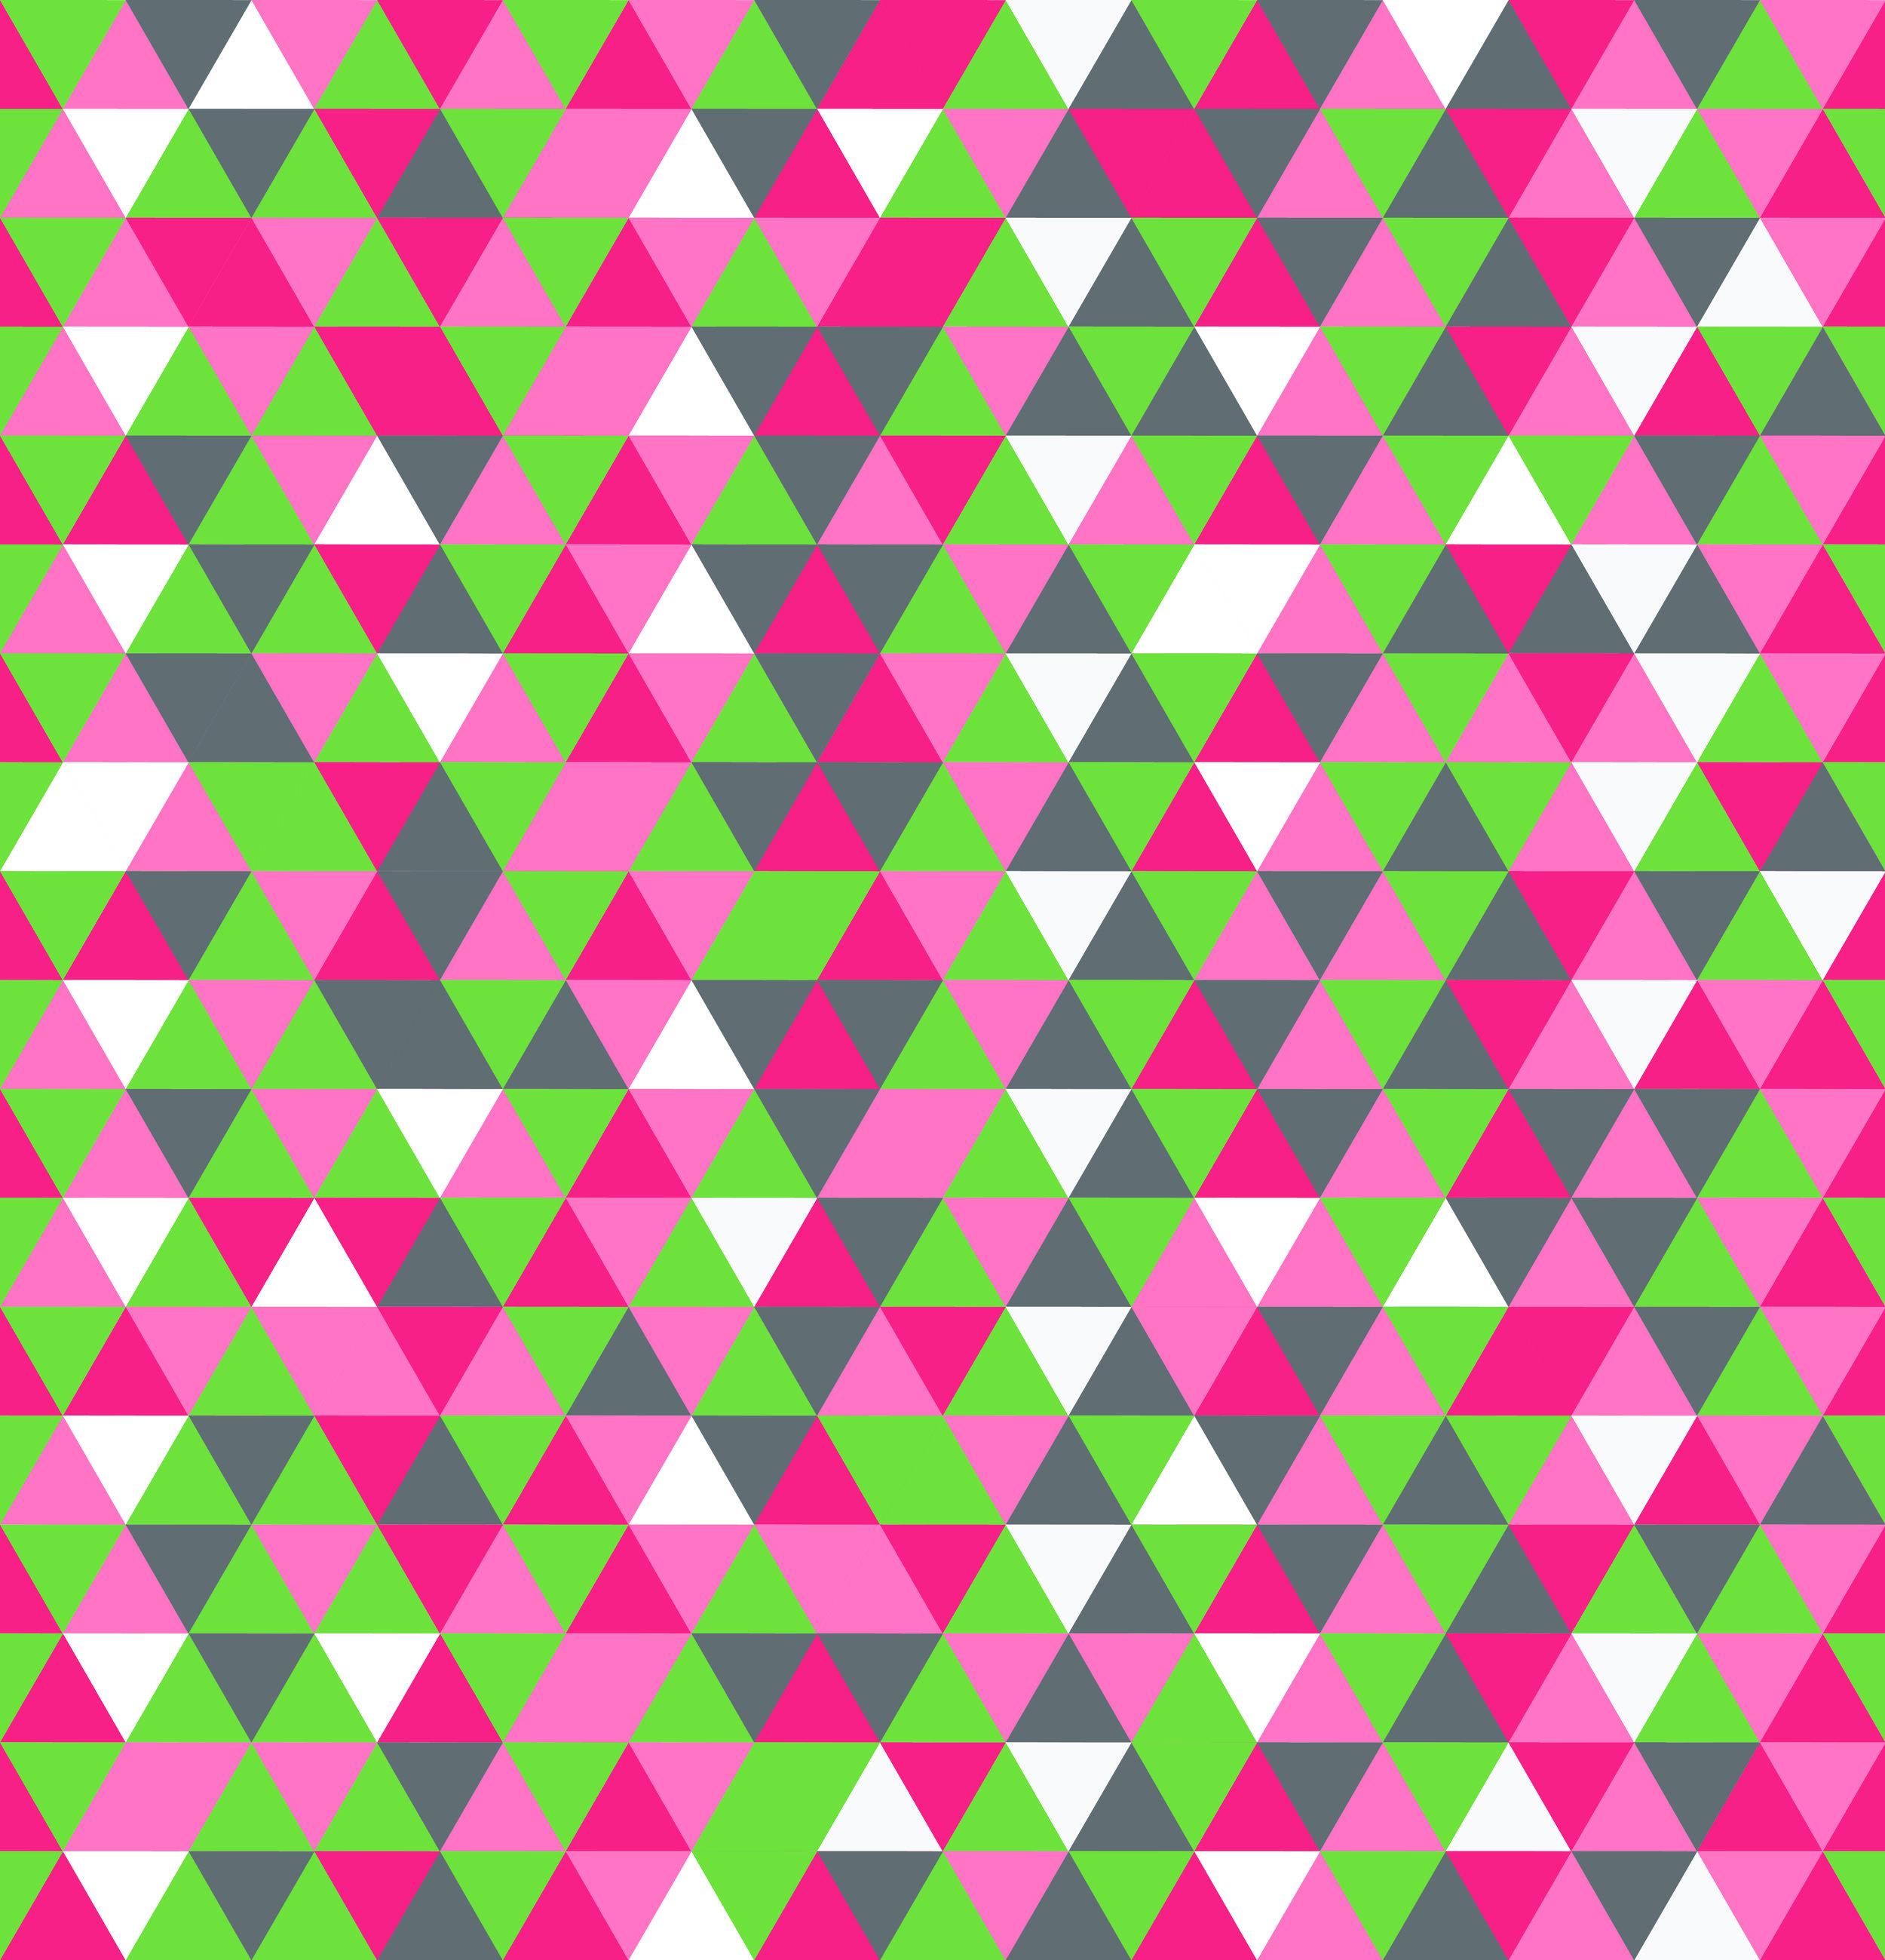 C4225_Pink_CottageTriangles.jpg